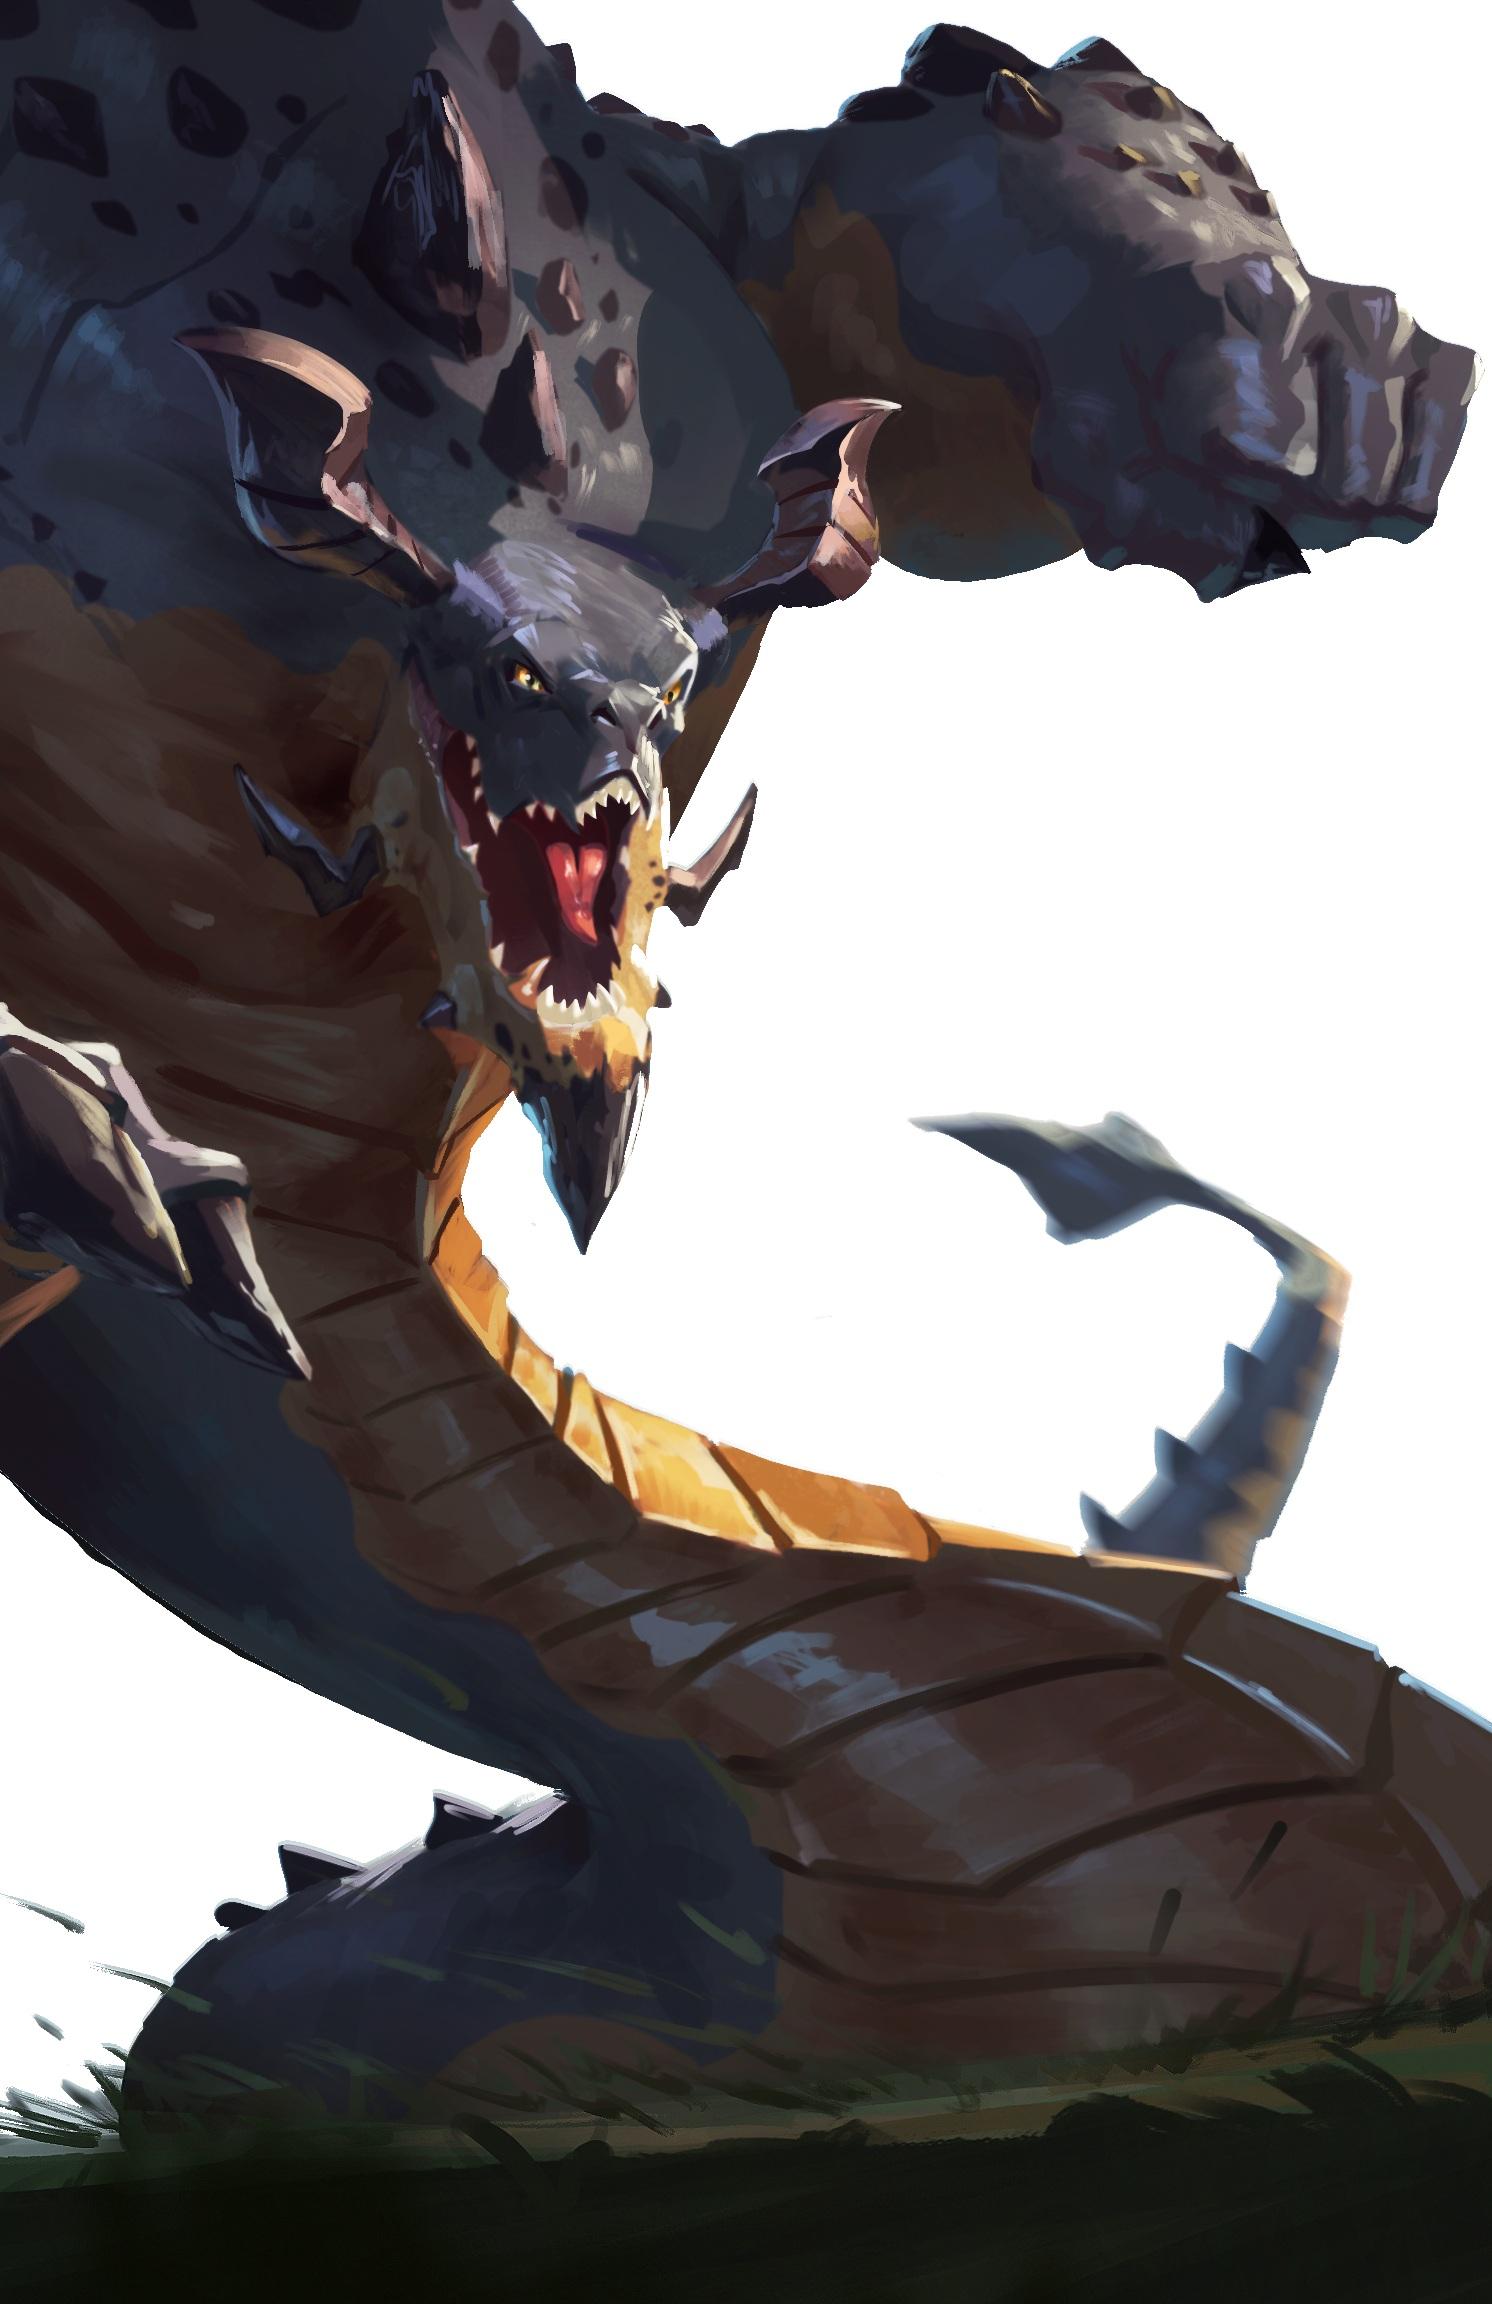 Dragon+Alone+White+BG+Thin.jpg